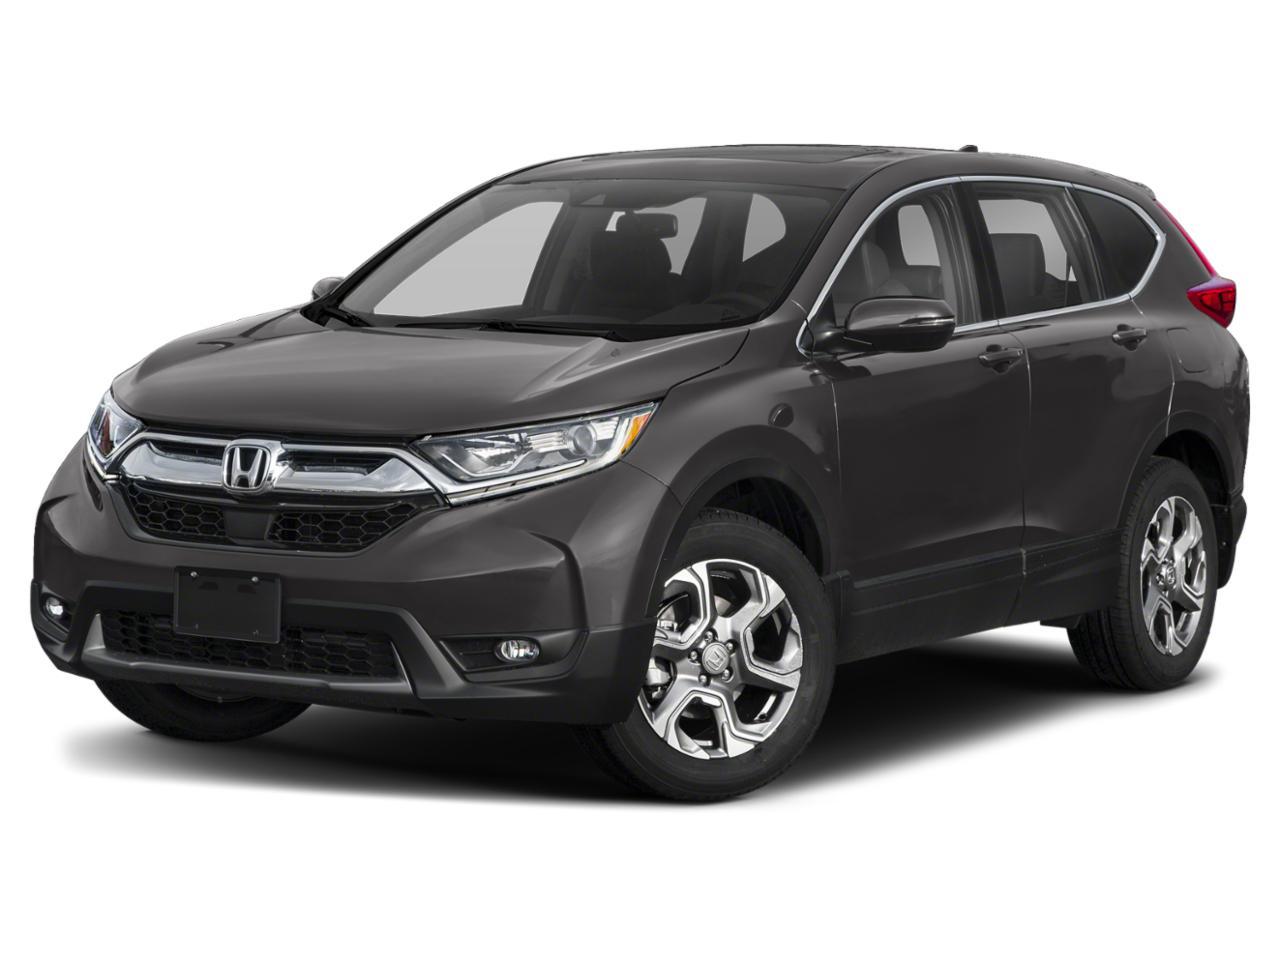 2019 Honda CR-V Vehicle Photo in Tulsa, OK 74133